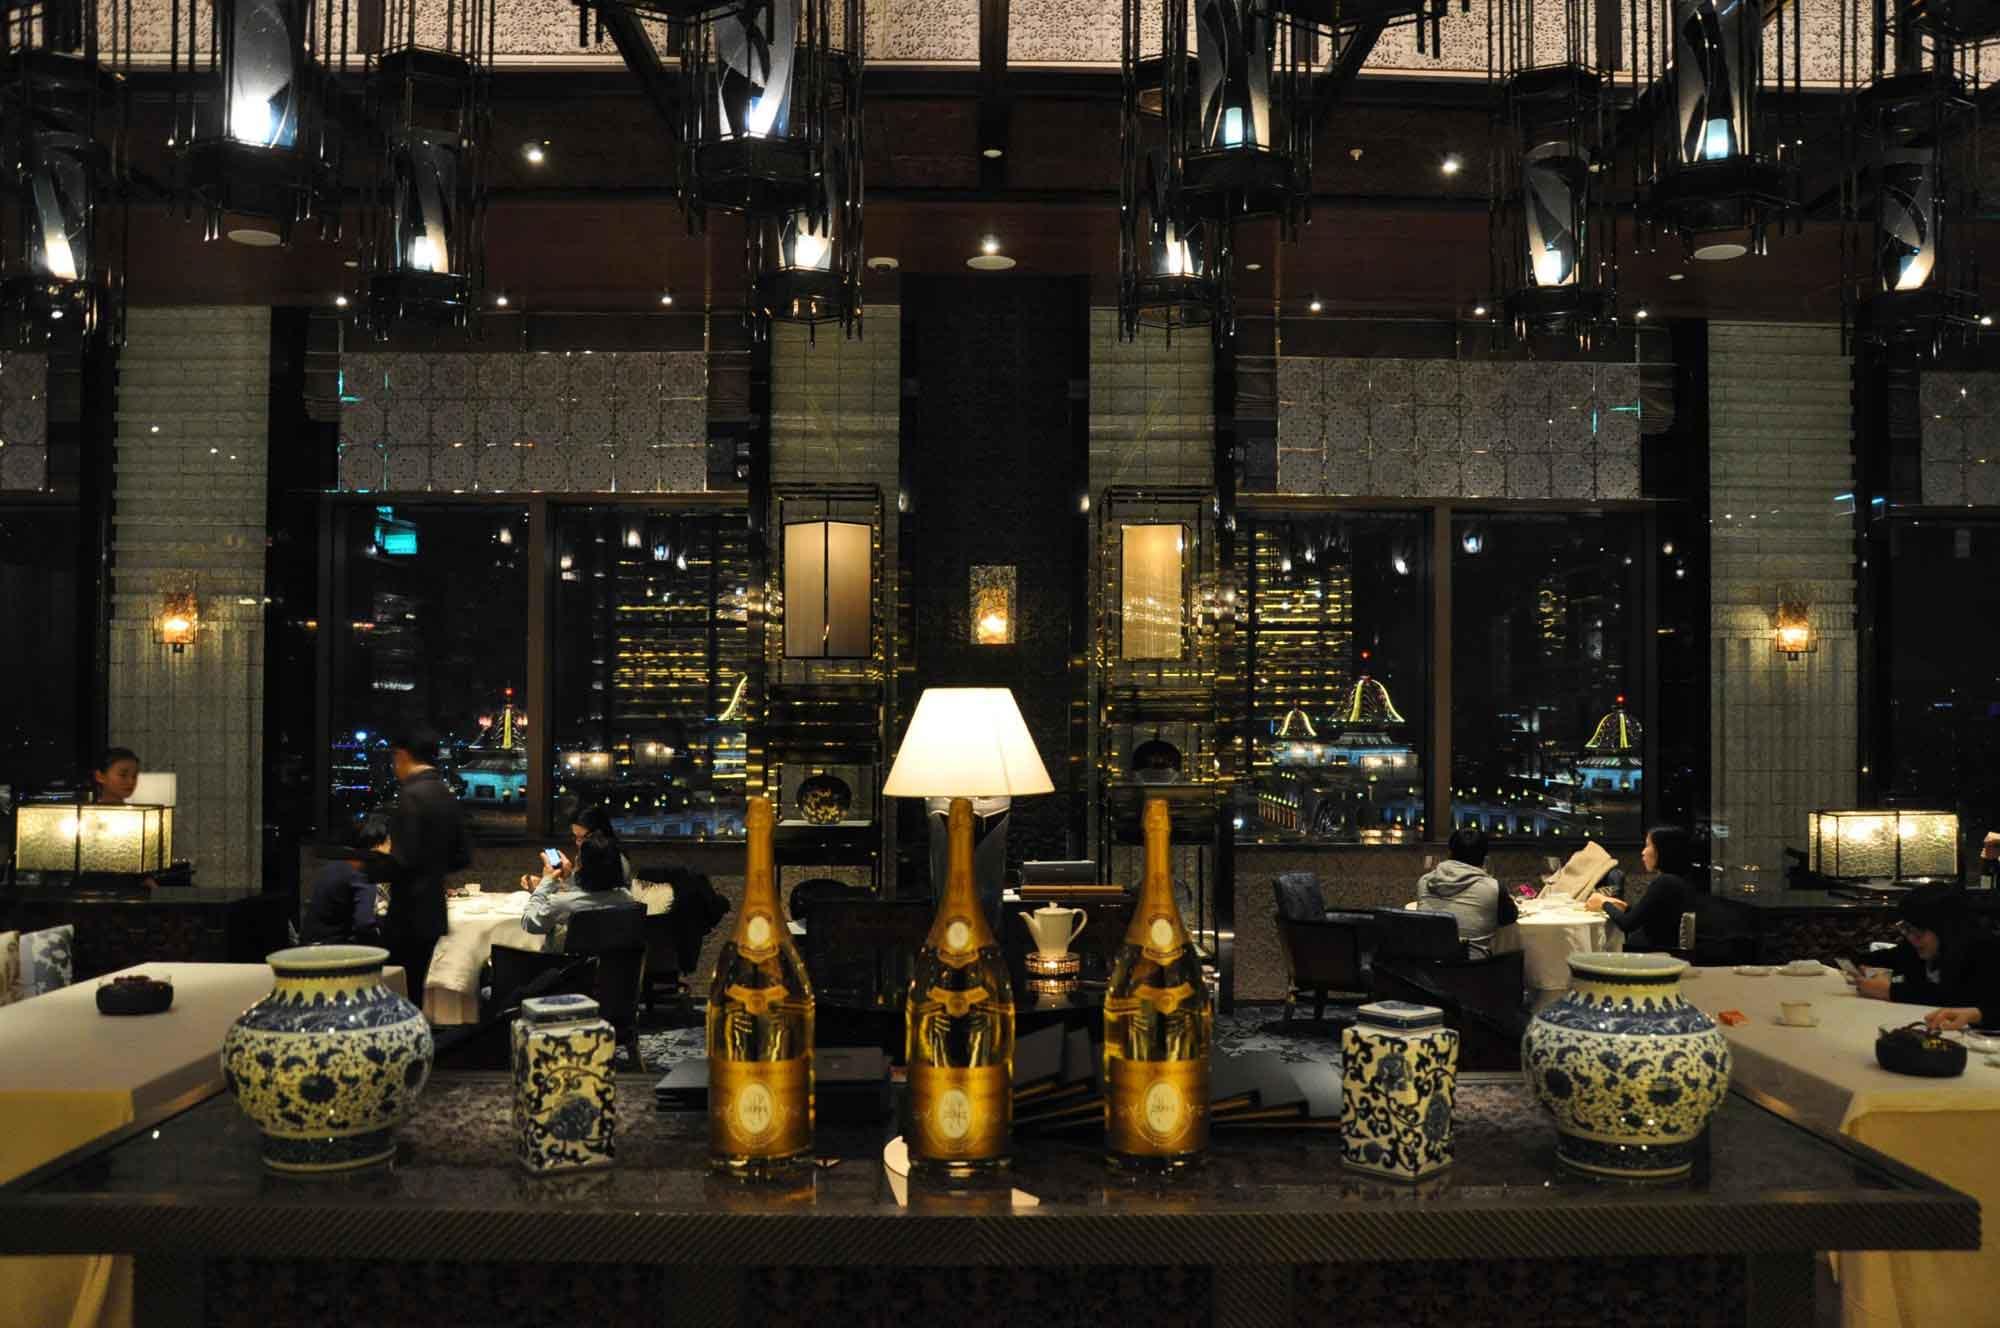 Lai Heen Macau table and bottles